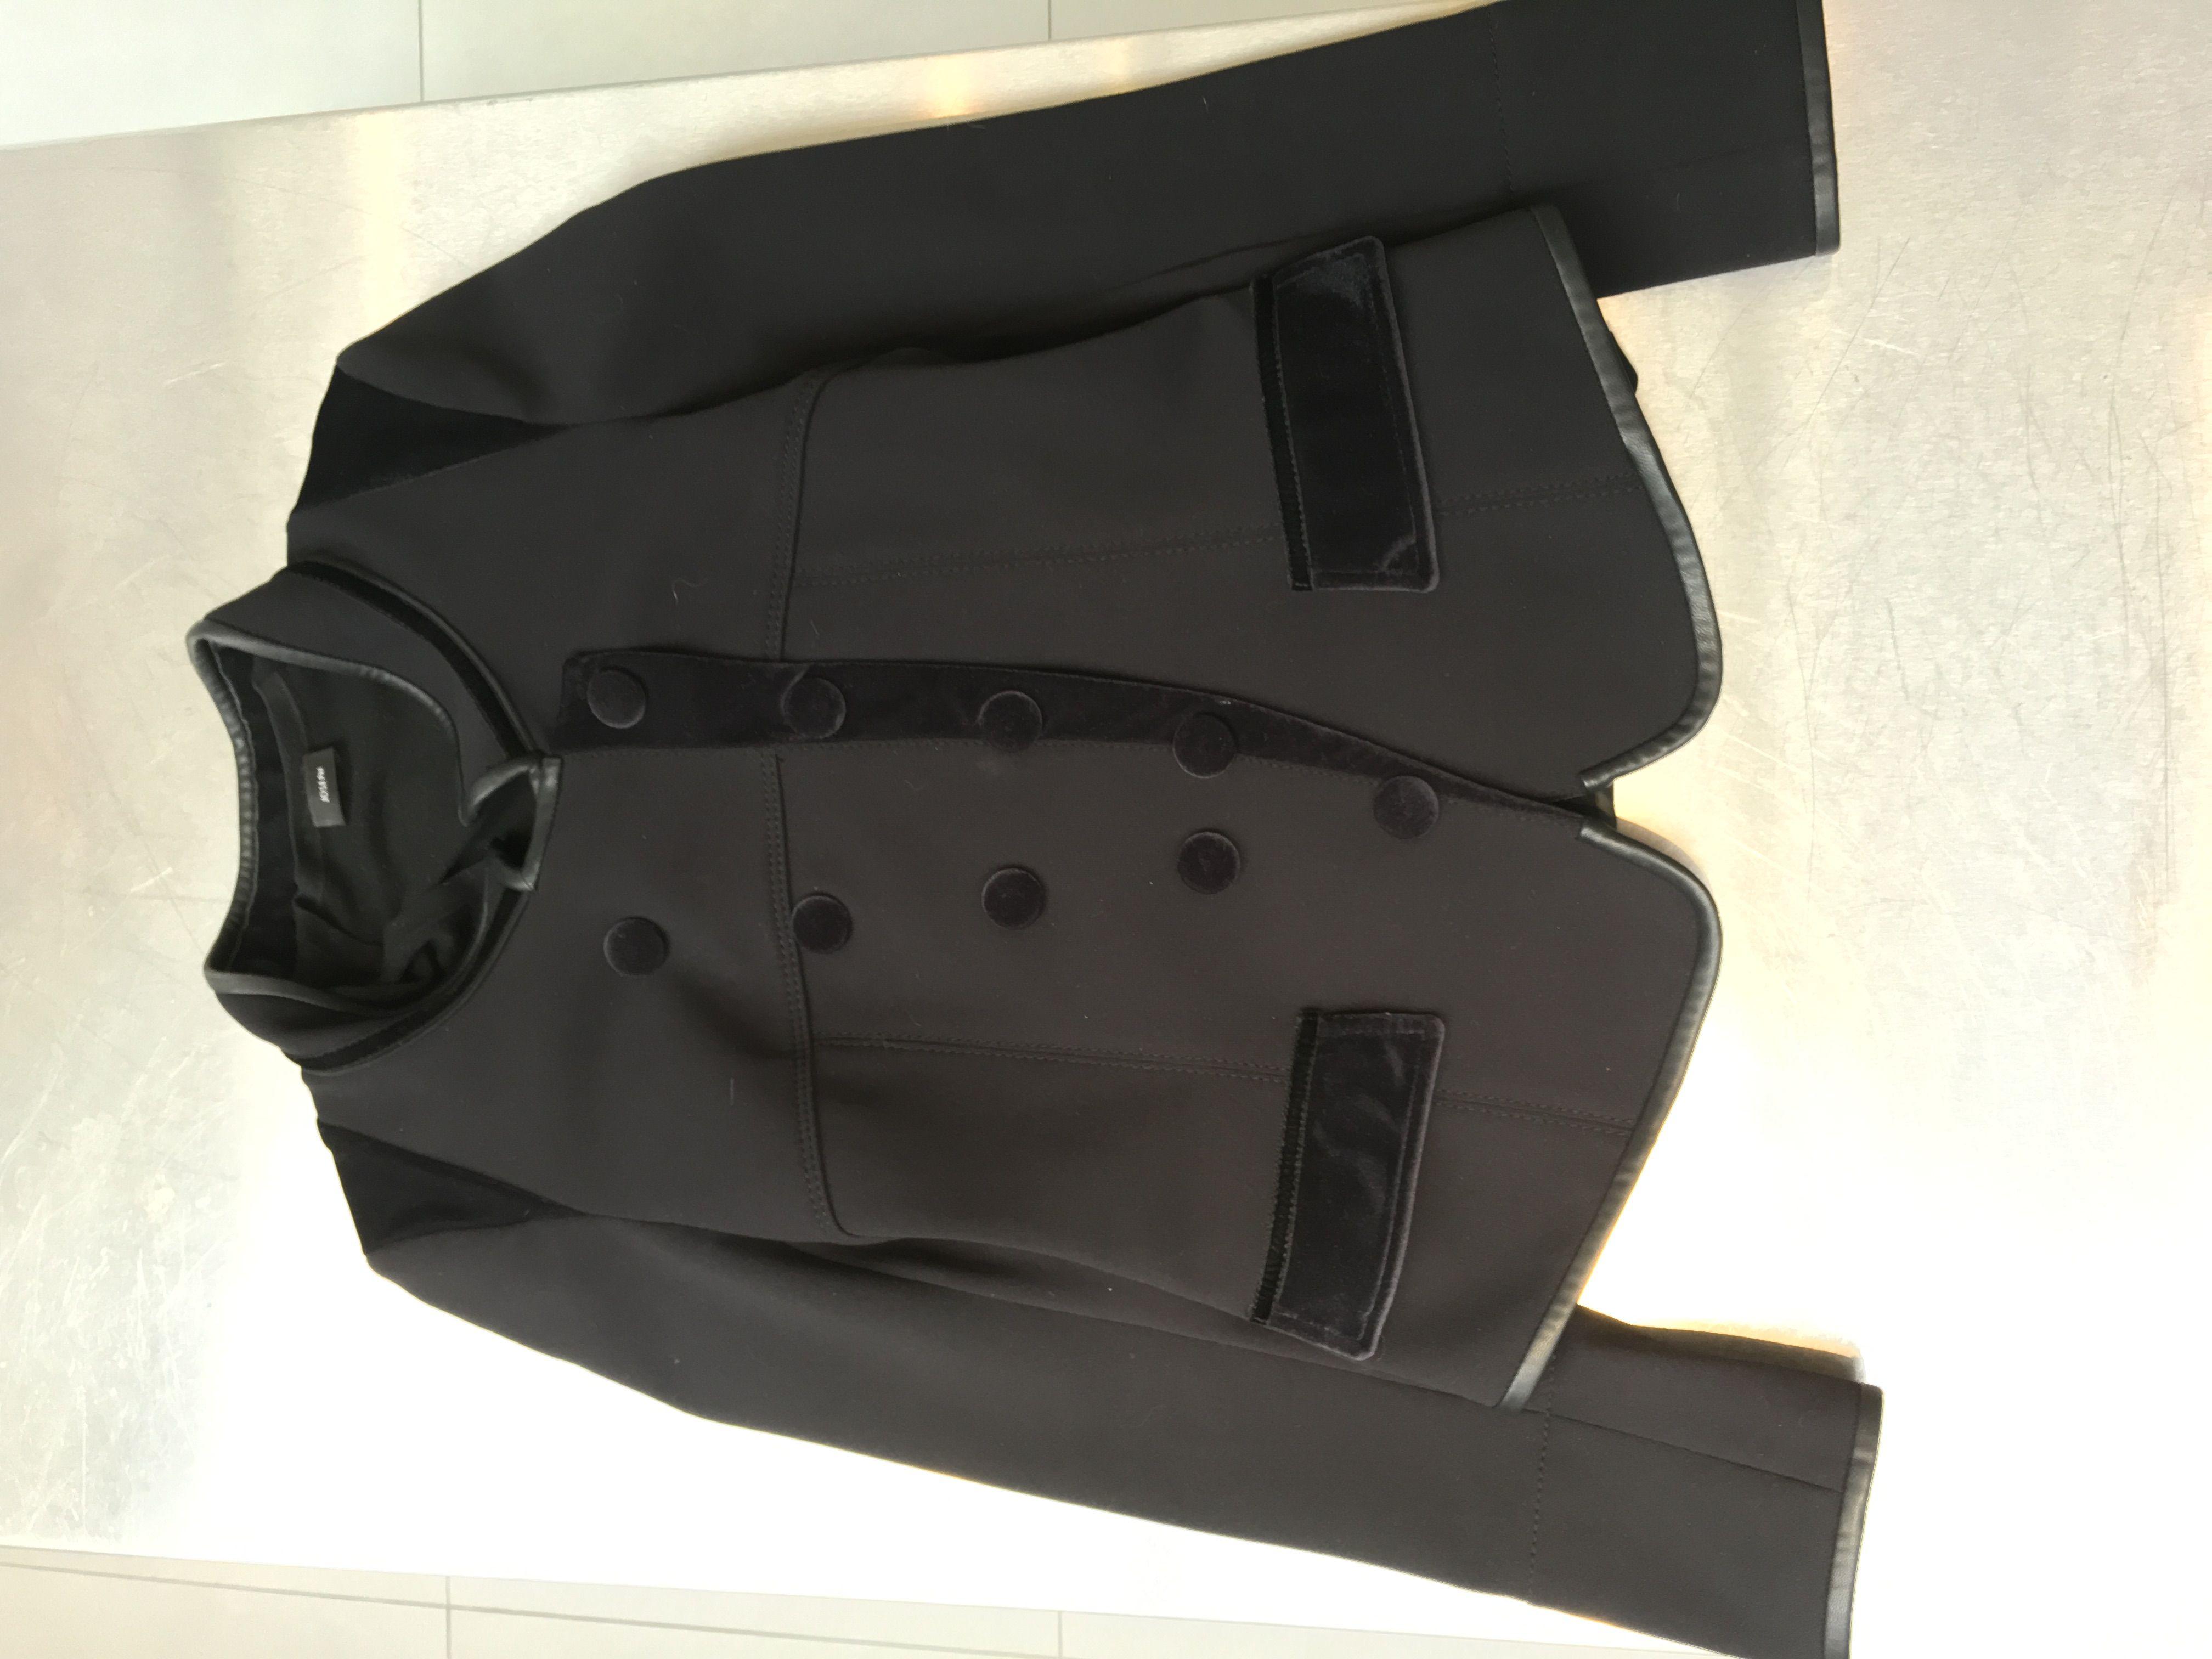 High Tech Jacket with leather and velvet trim  #fashion #blackjachet  www.fizzoflife.com